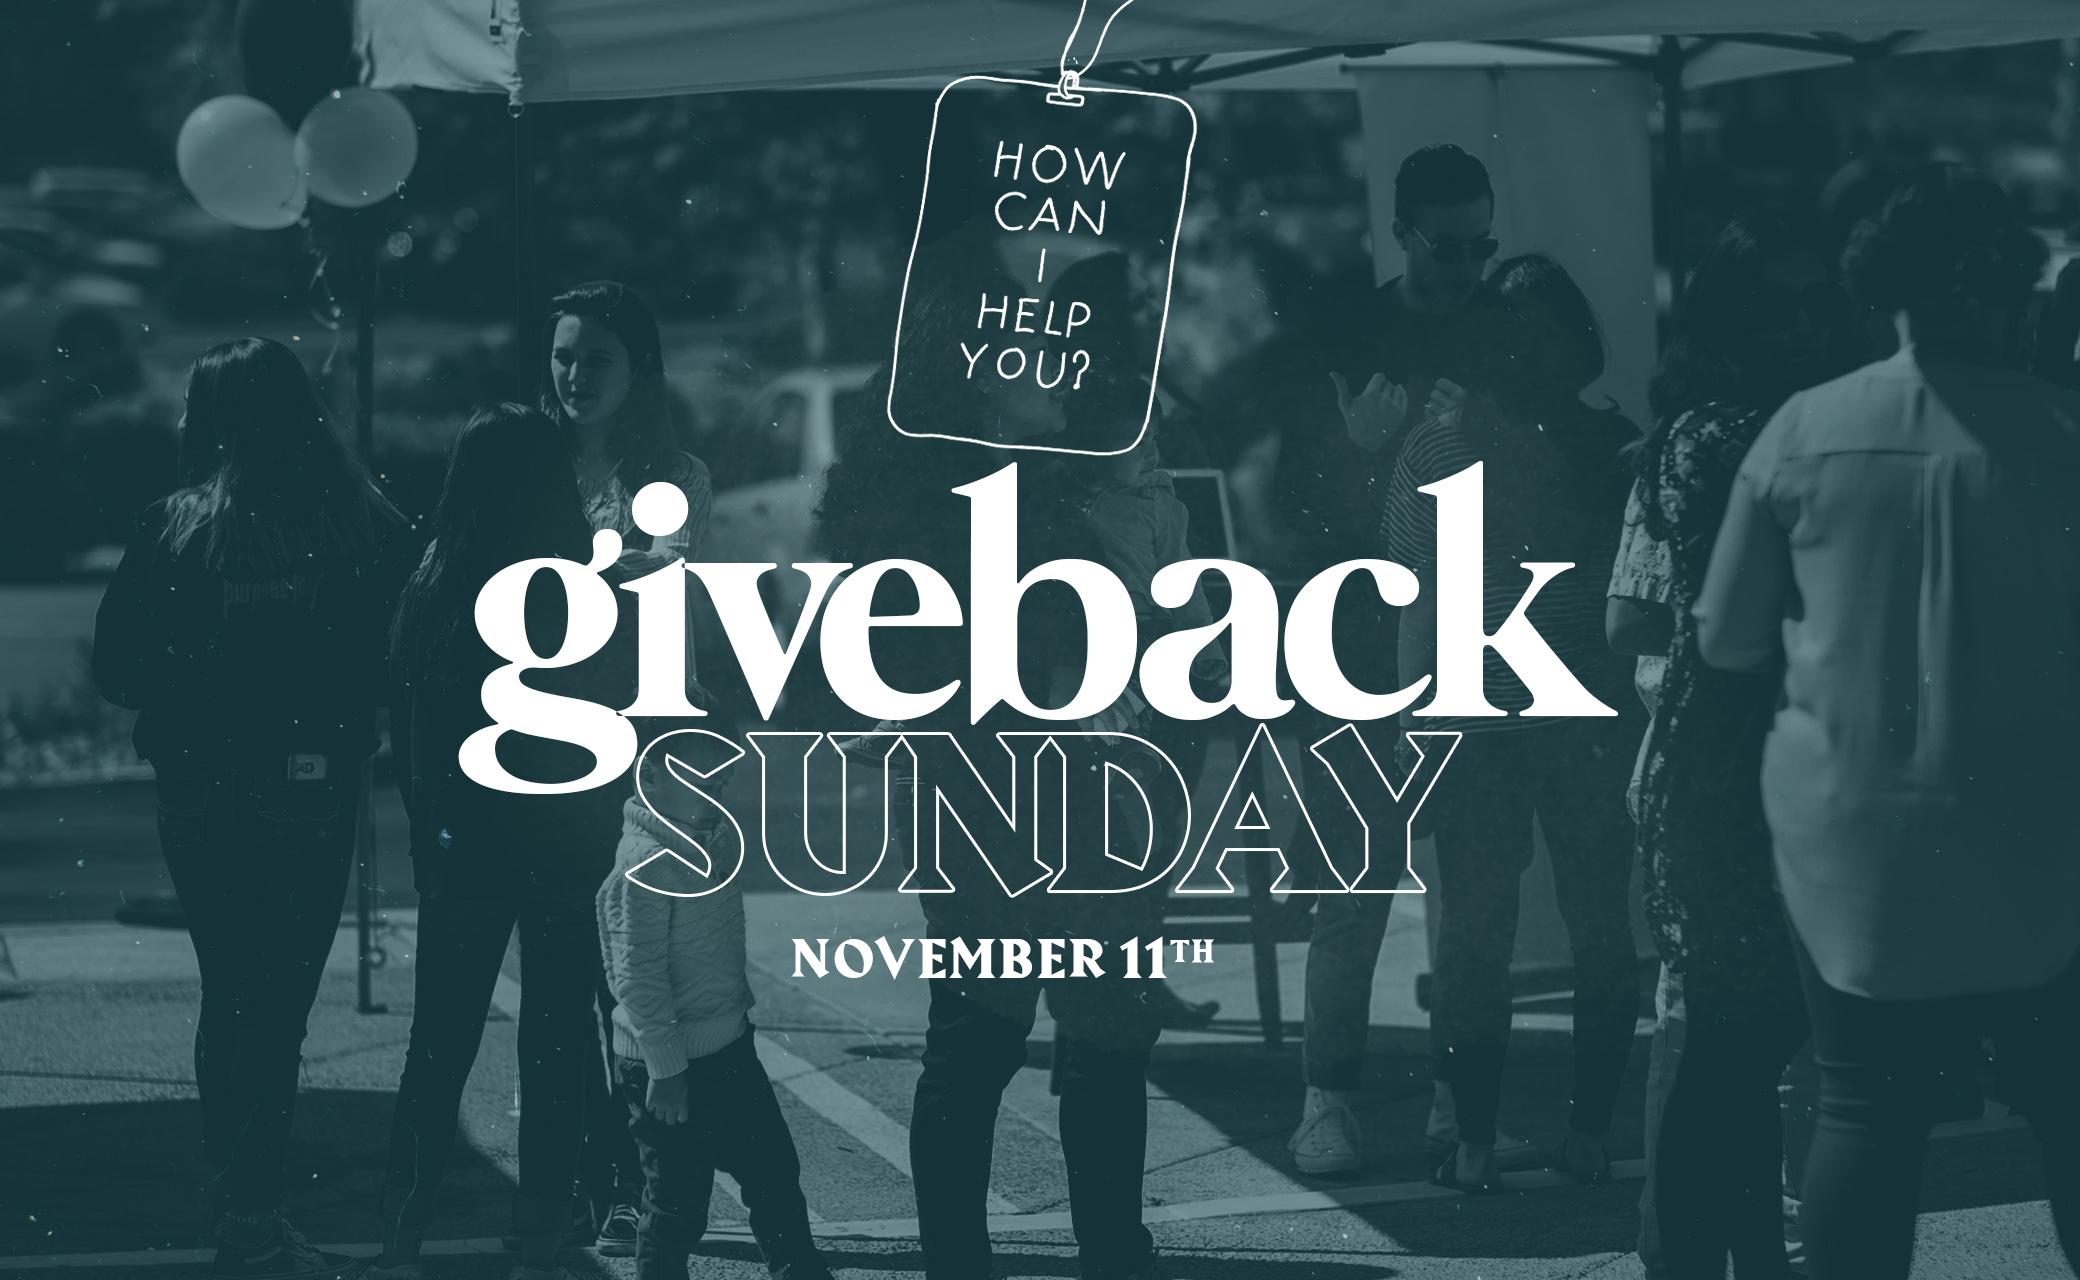 give back sunday.jpg